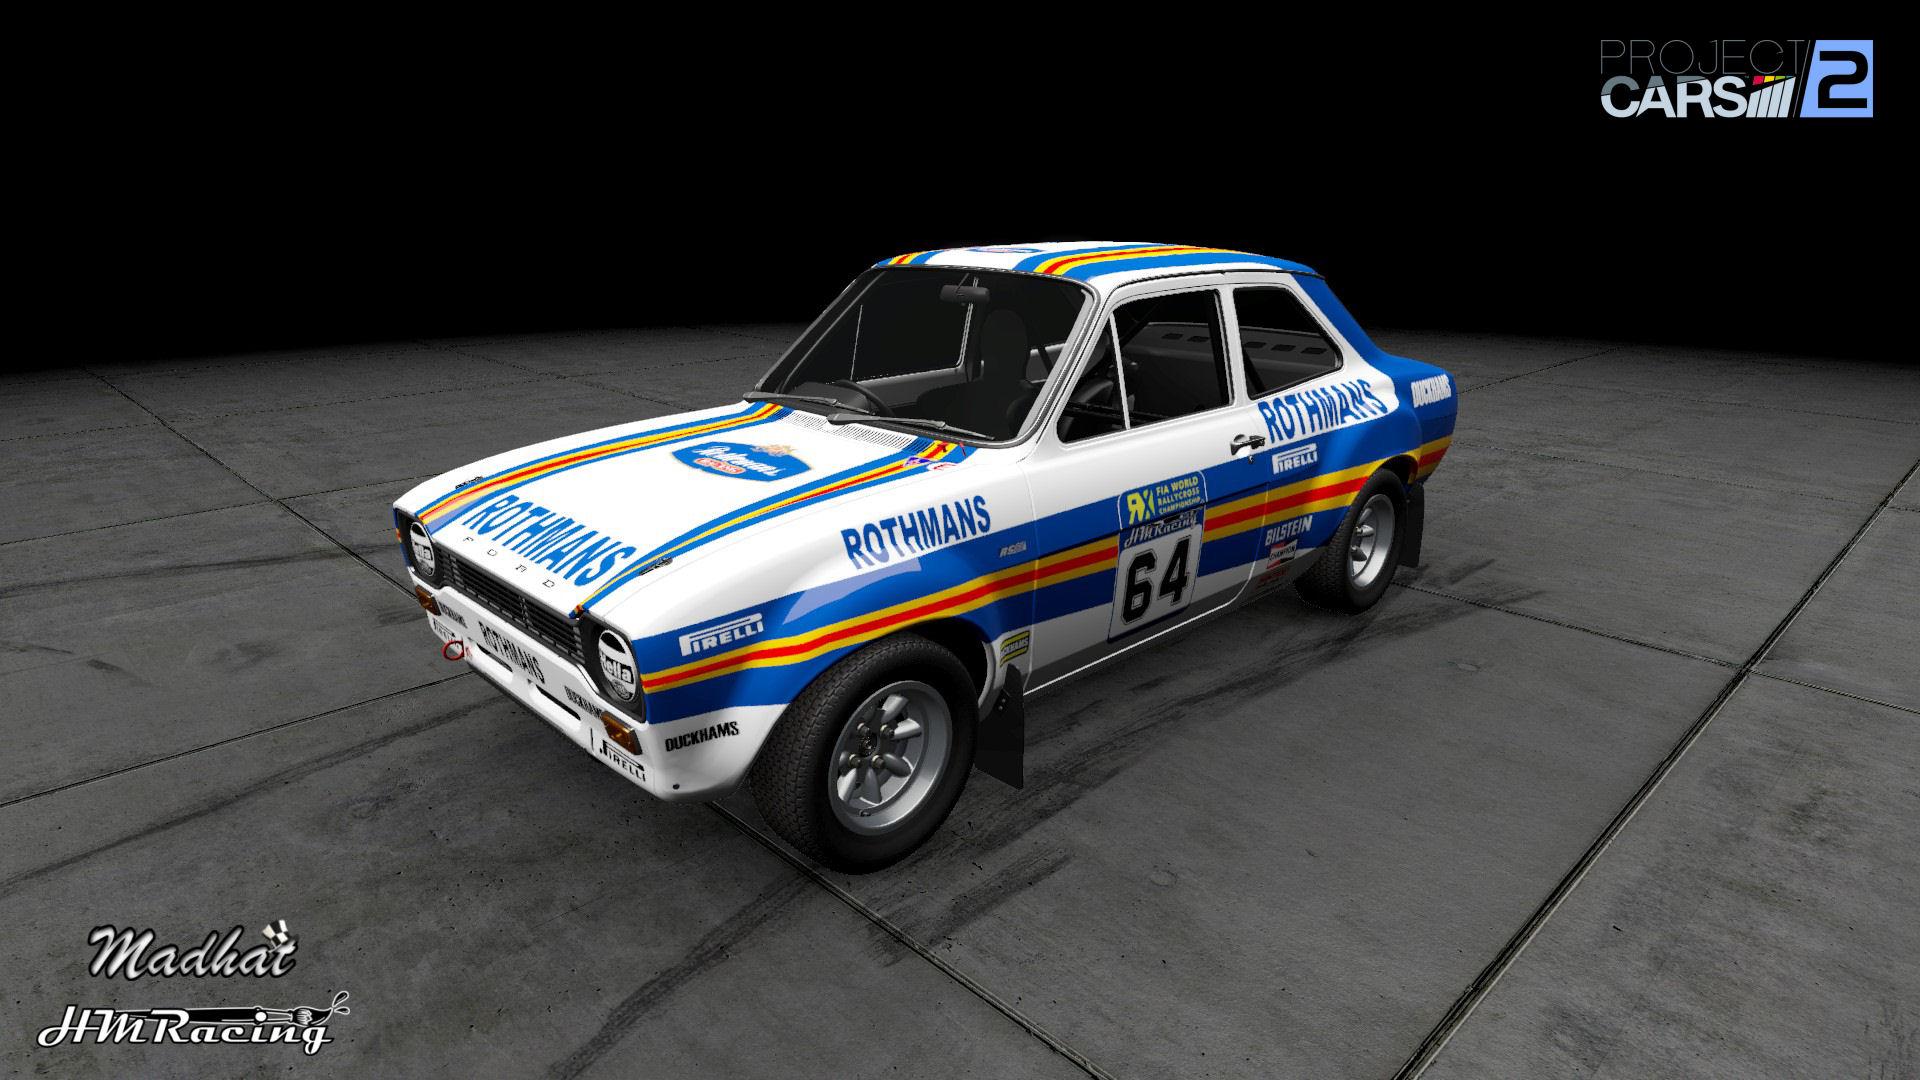 Ford Escort mk1 rx Rothmans 01.jpg